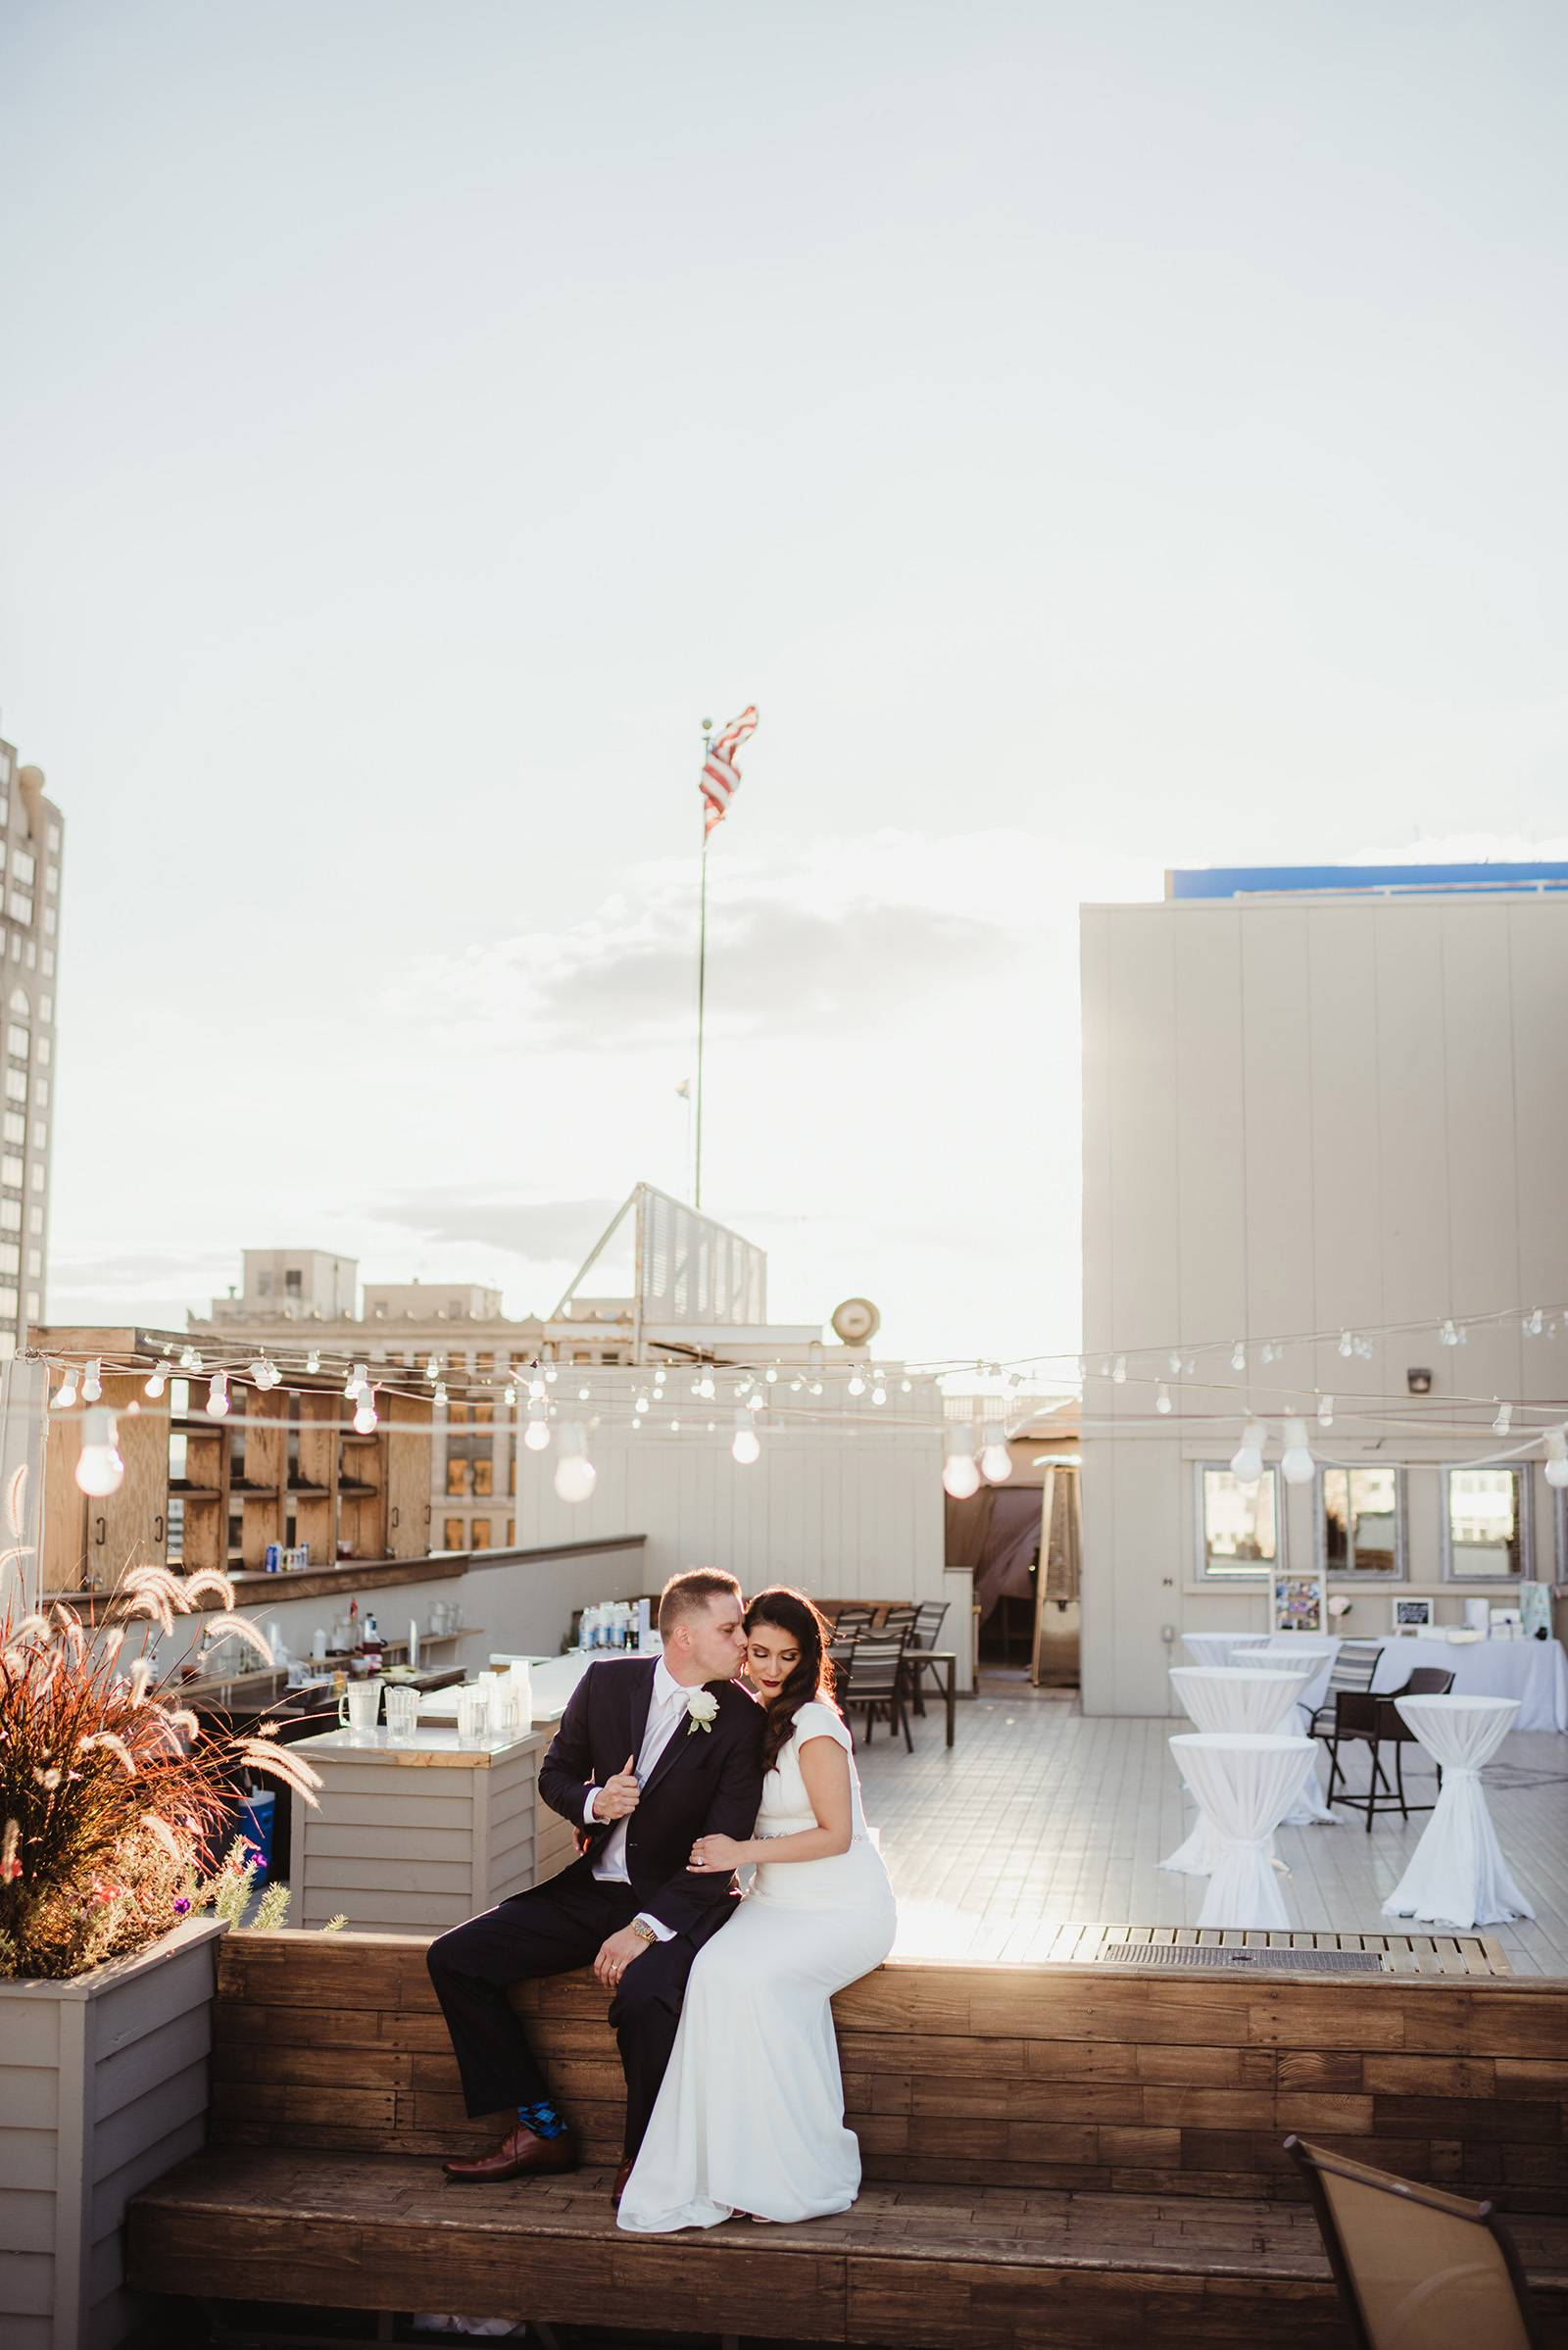 Wedding Planner & Guide